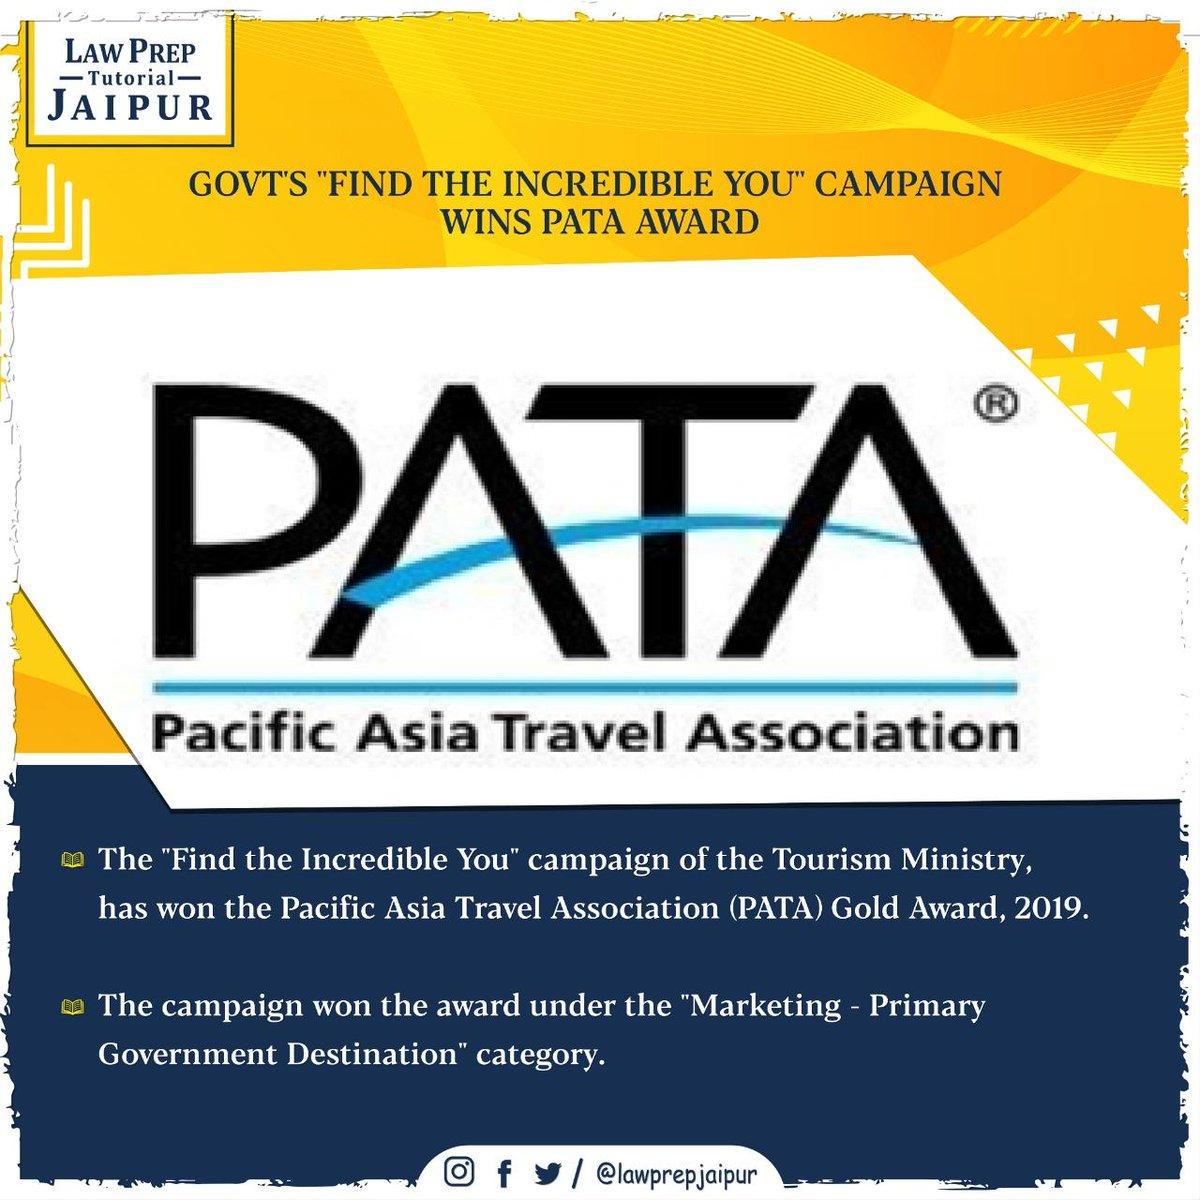 Stay connected for more such Current Affairs.  #Gk #CLATGK #CLAT2020 #CLATQuestions #currentaffairs #LegalGk #PATA #PacificAsiaTravelAssociation #IncredibleIndia #IndiaTourism